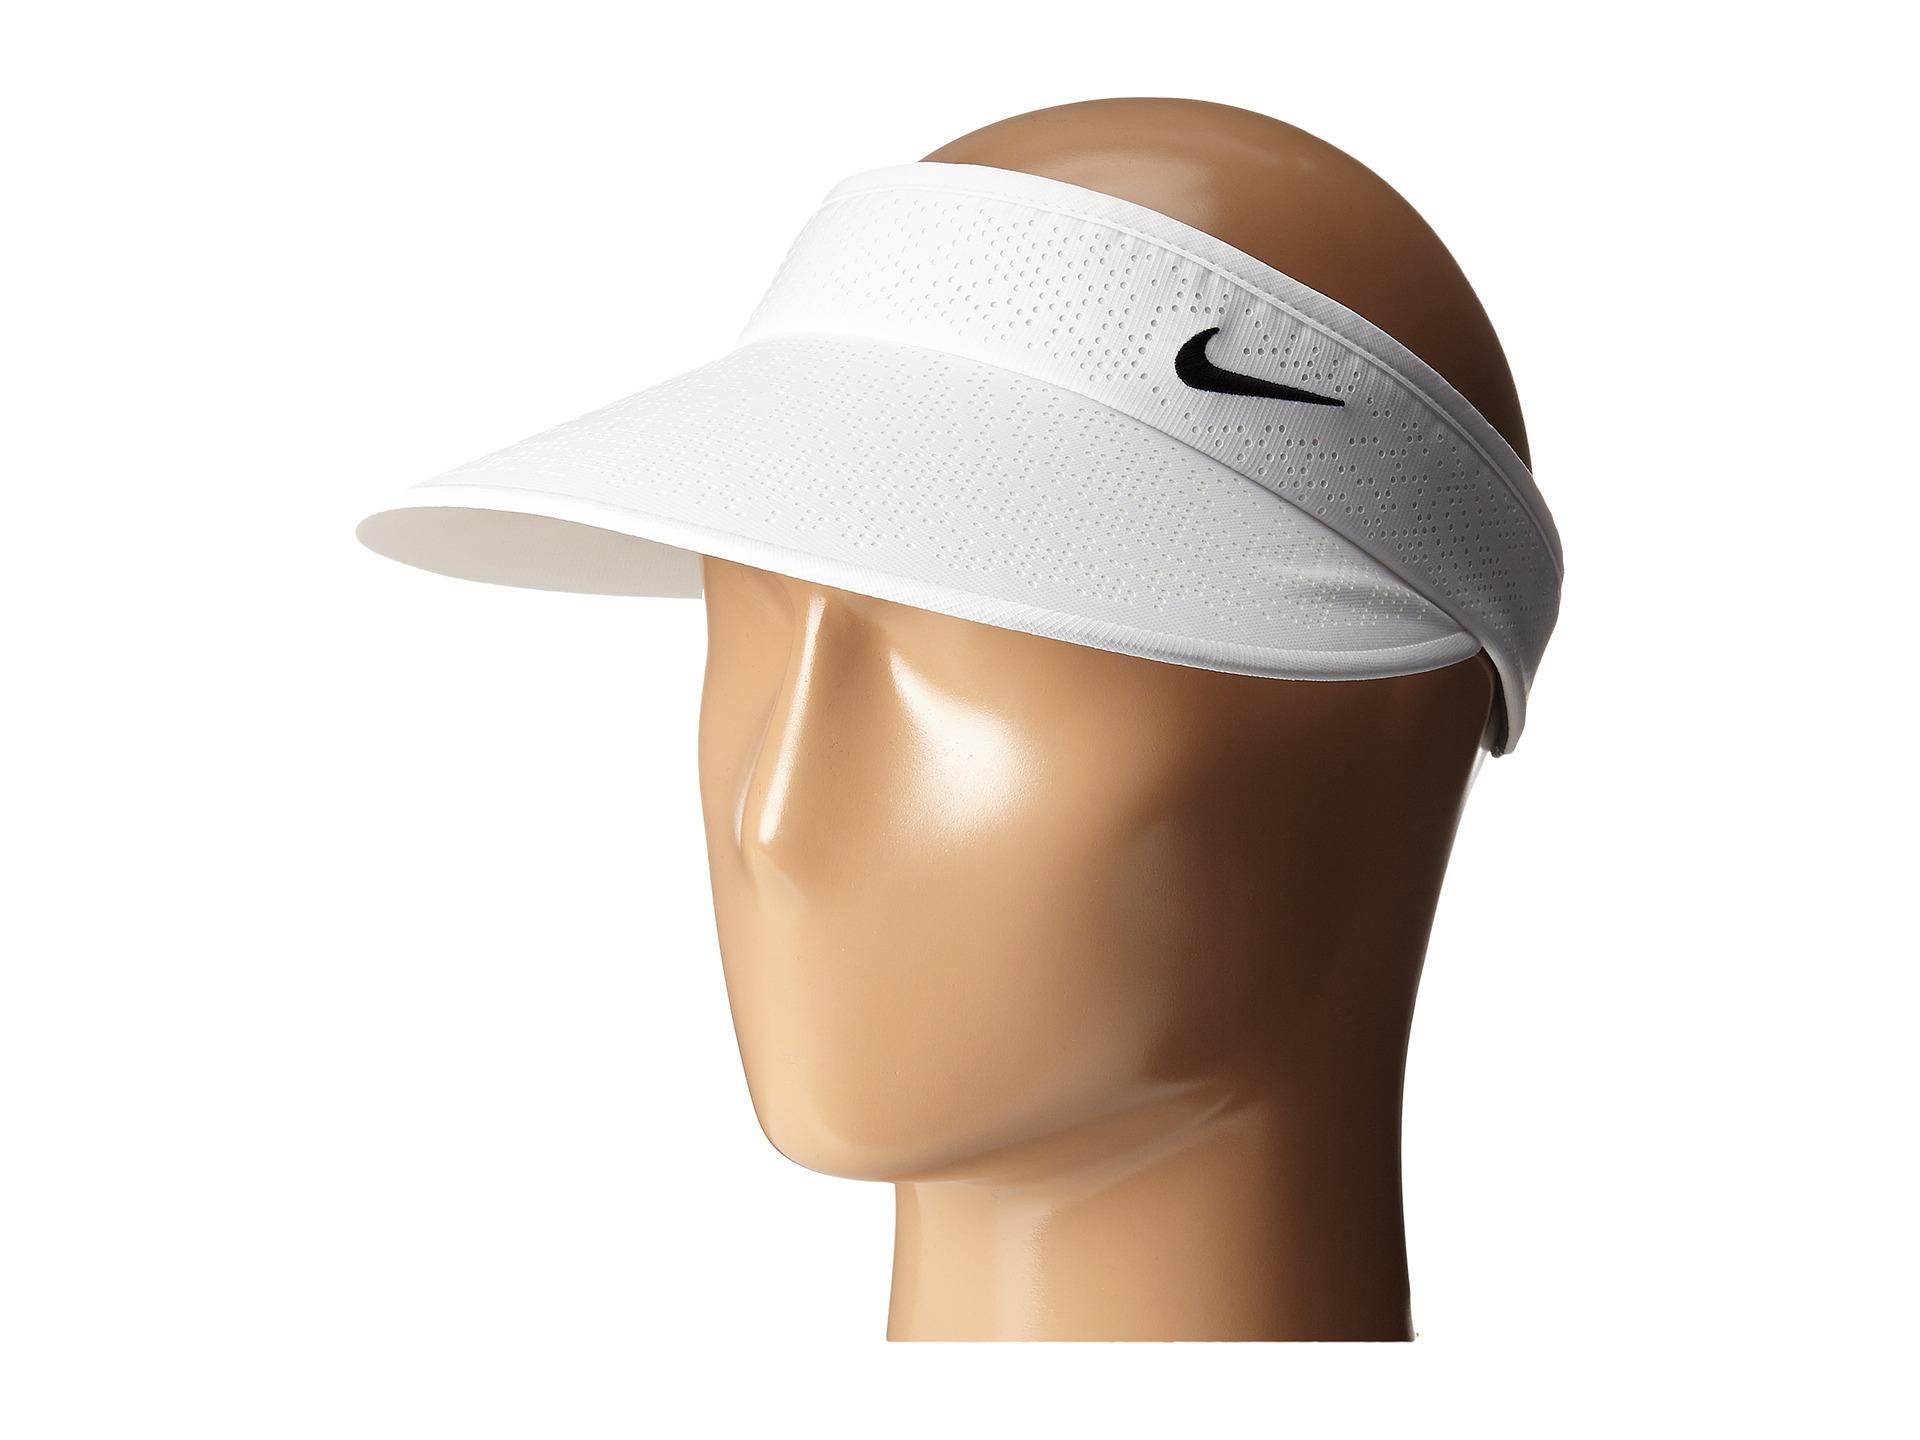 Lyst - Nike Big Bill Visor 2.0 in White 648362a9d10